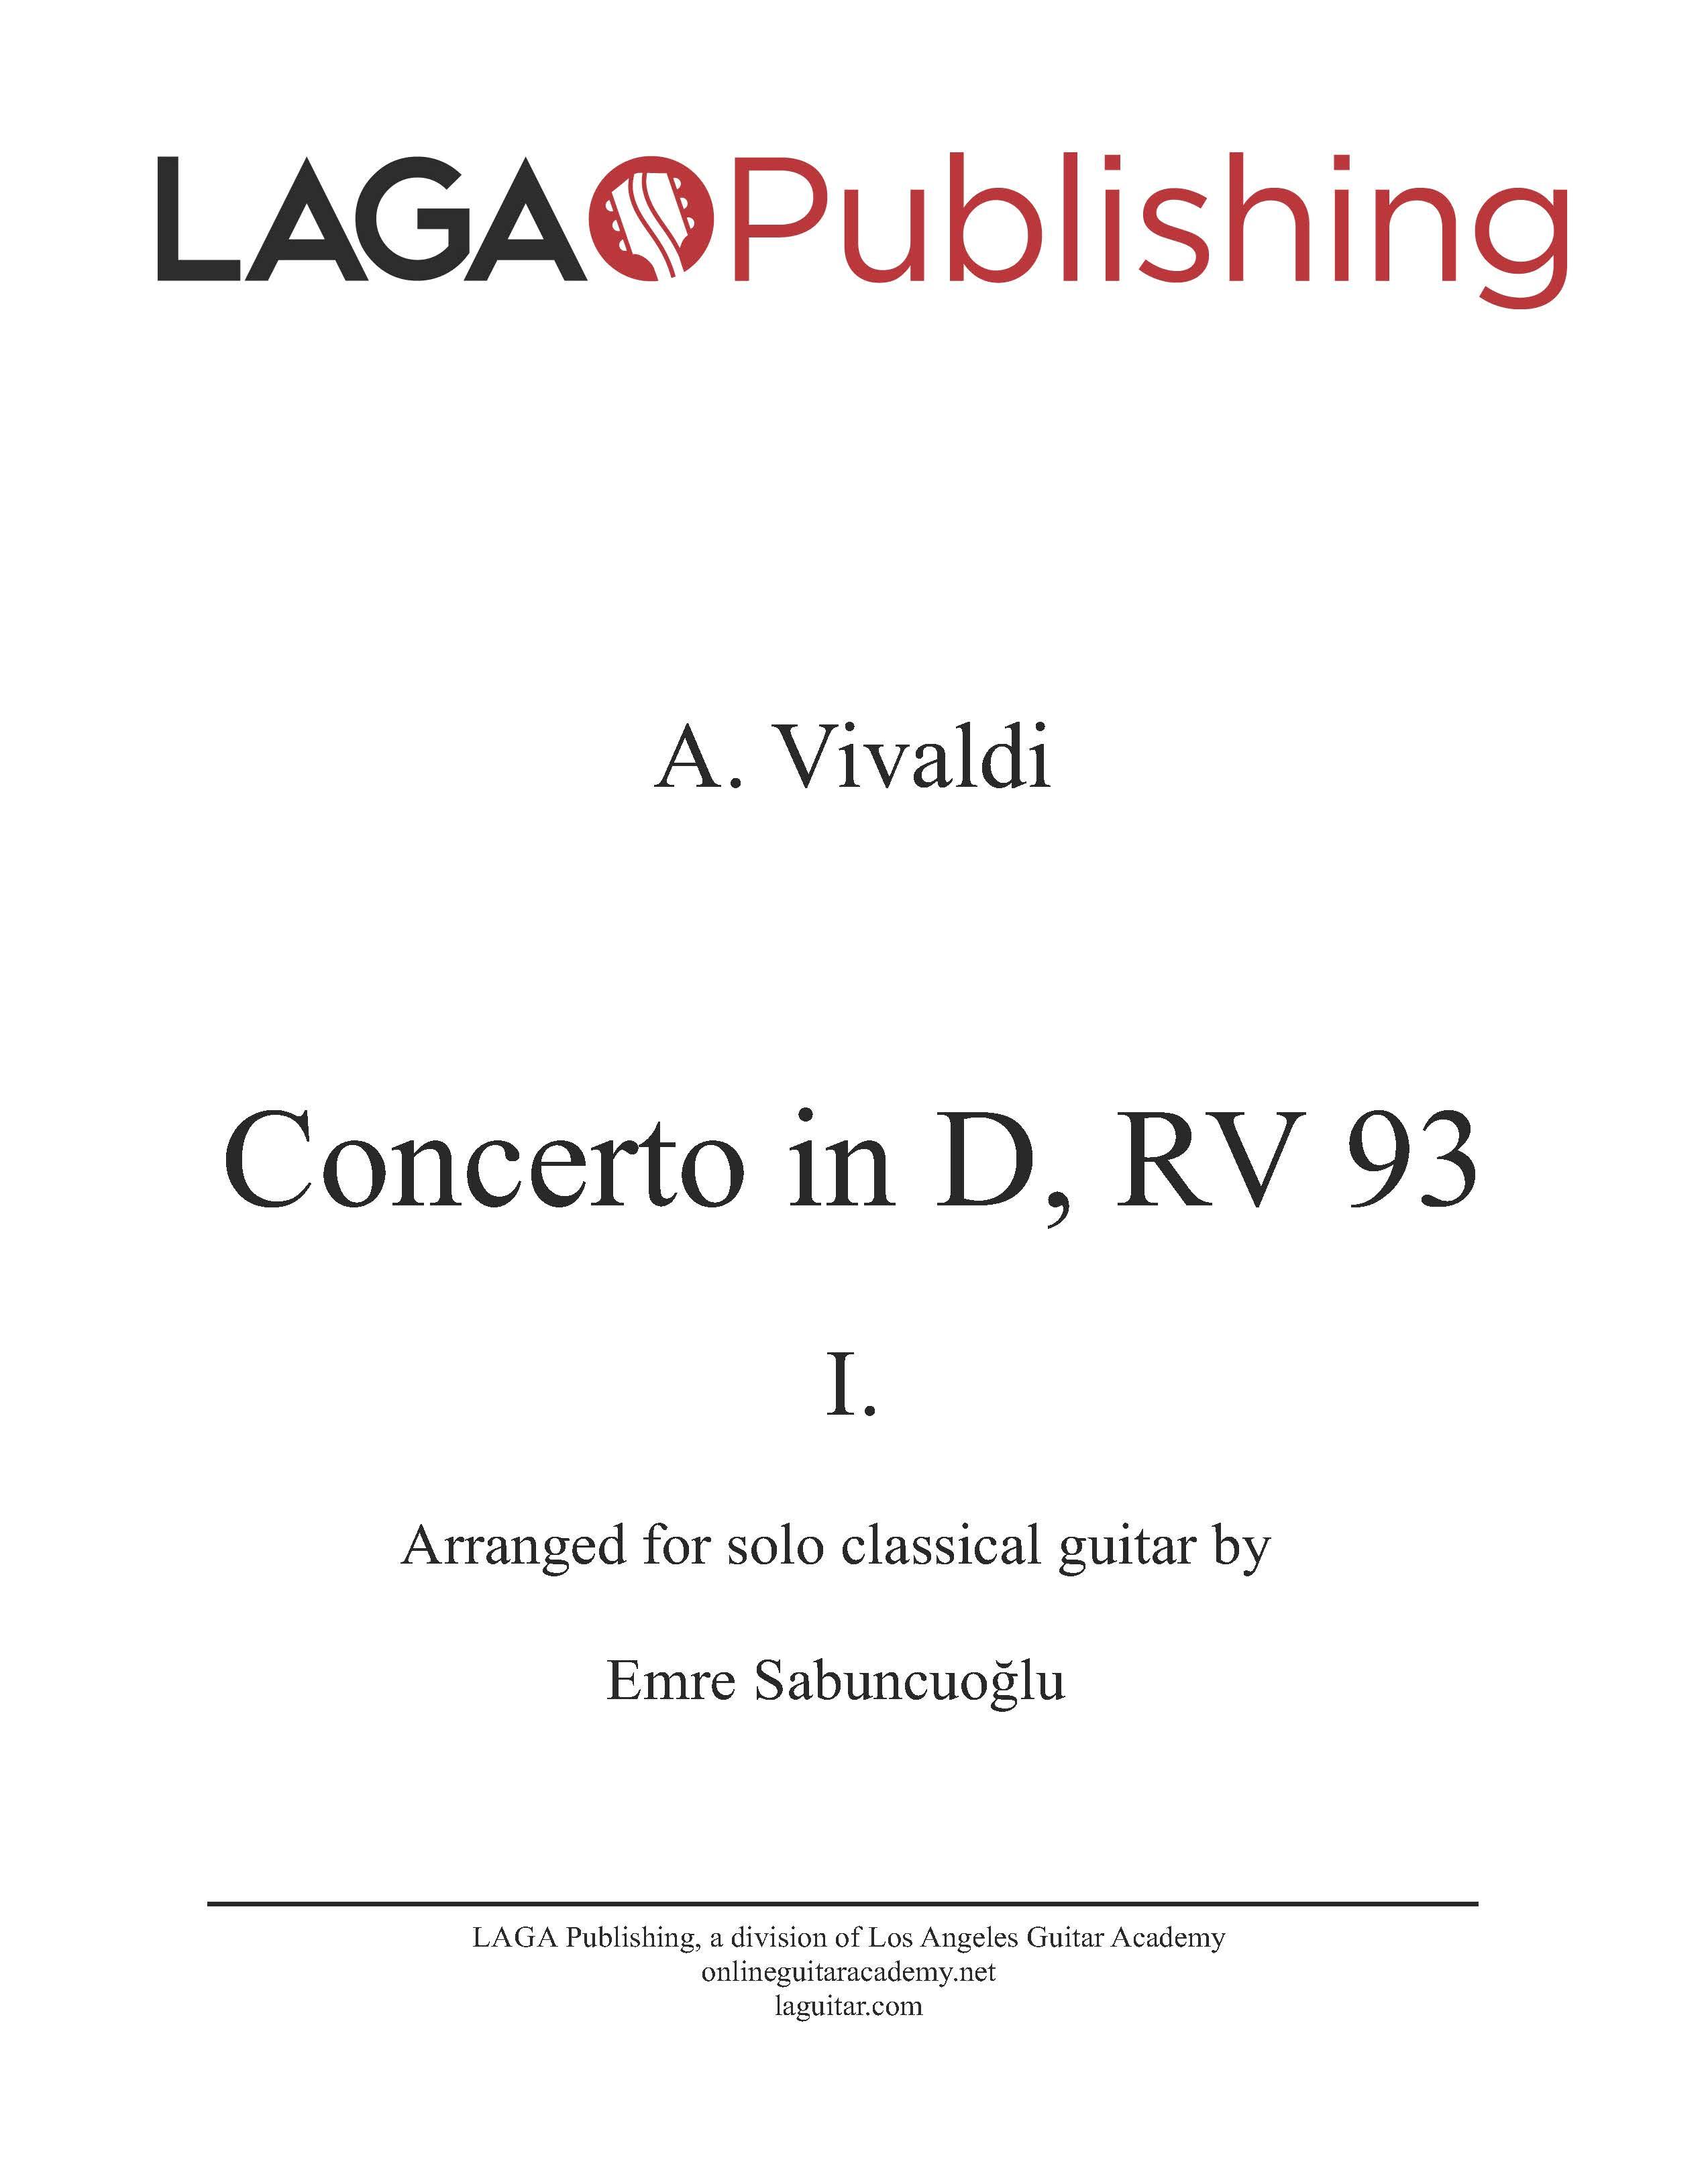 LAGA-Publishing-Vivaldi-Concerto-RV93-I-Score-and-Tab